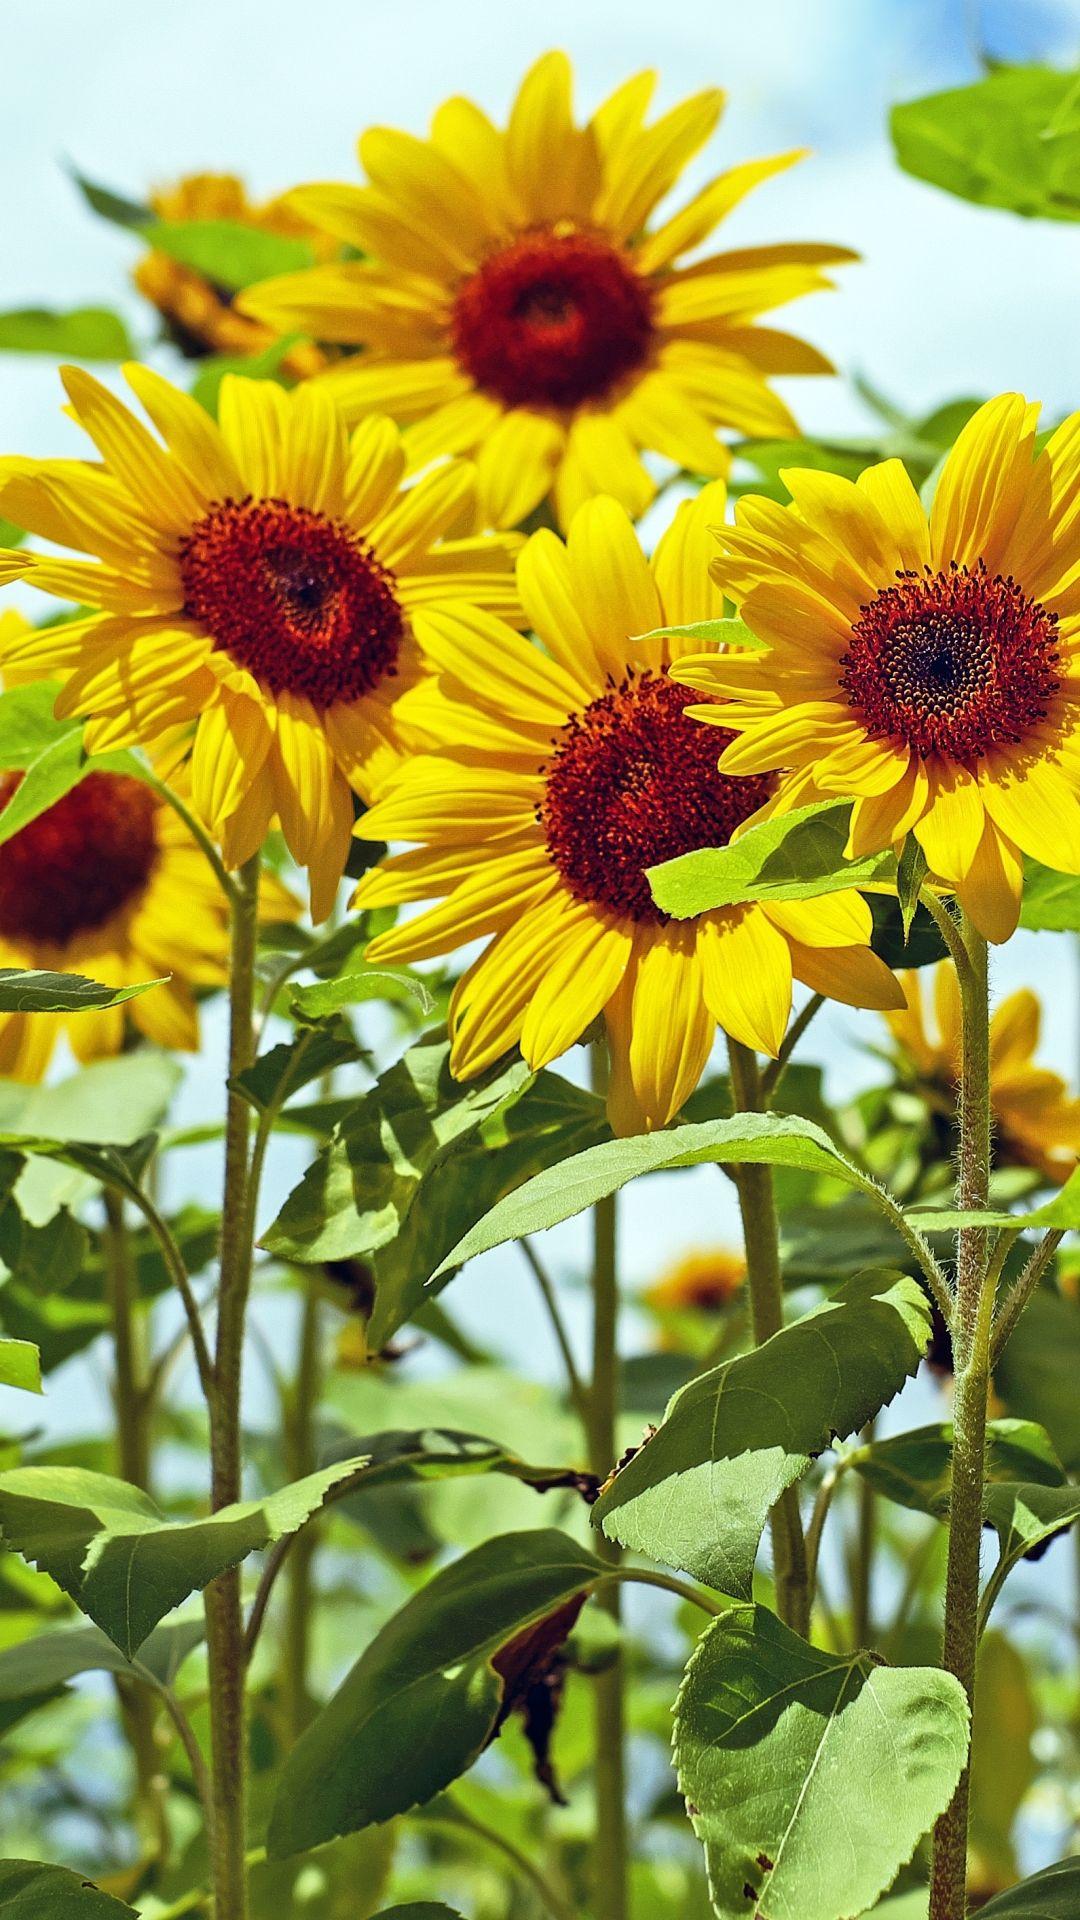 Yellow Flowers Iphone Picture Is 4K Wallpaper Papel de